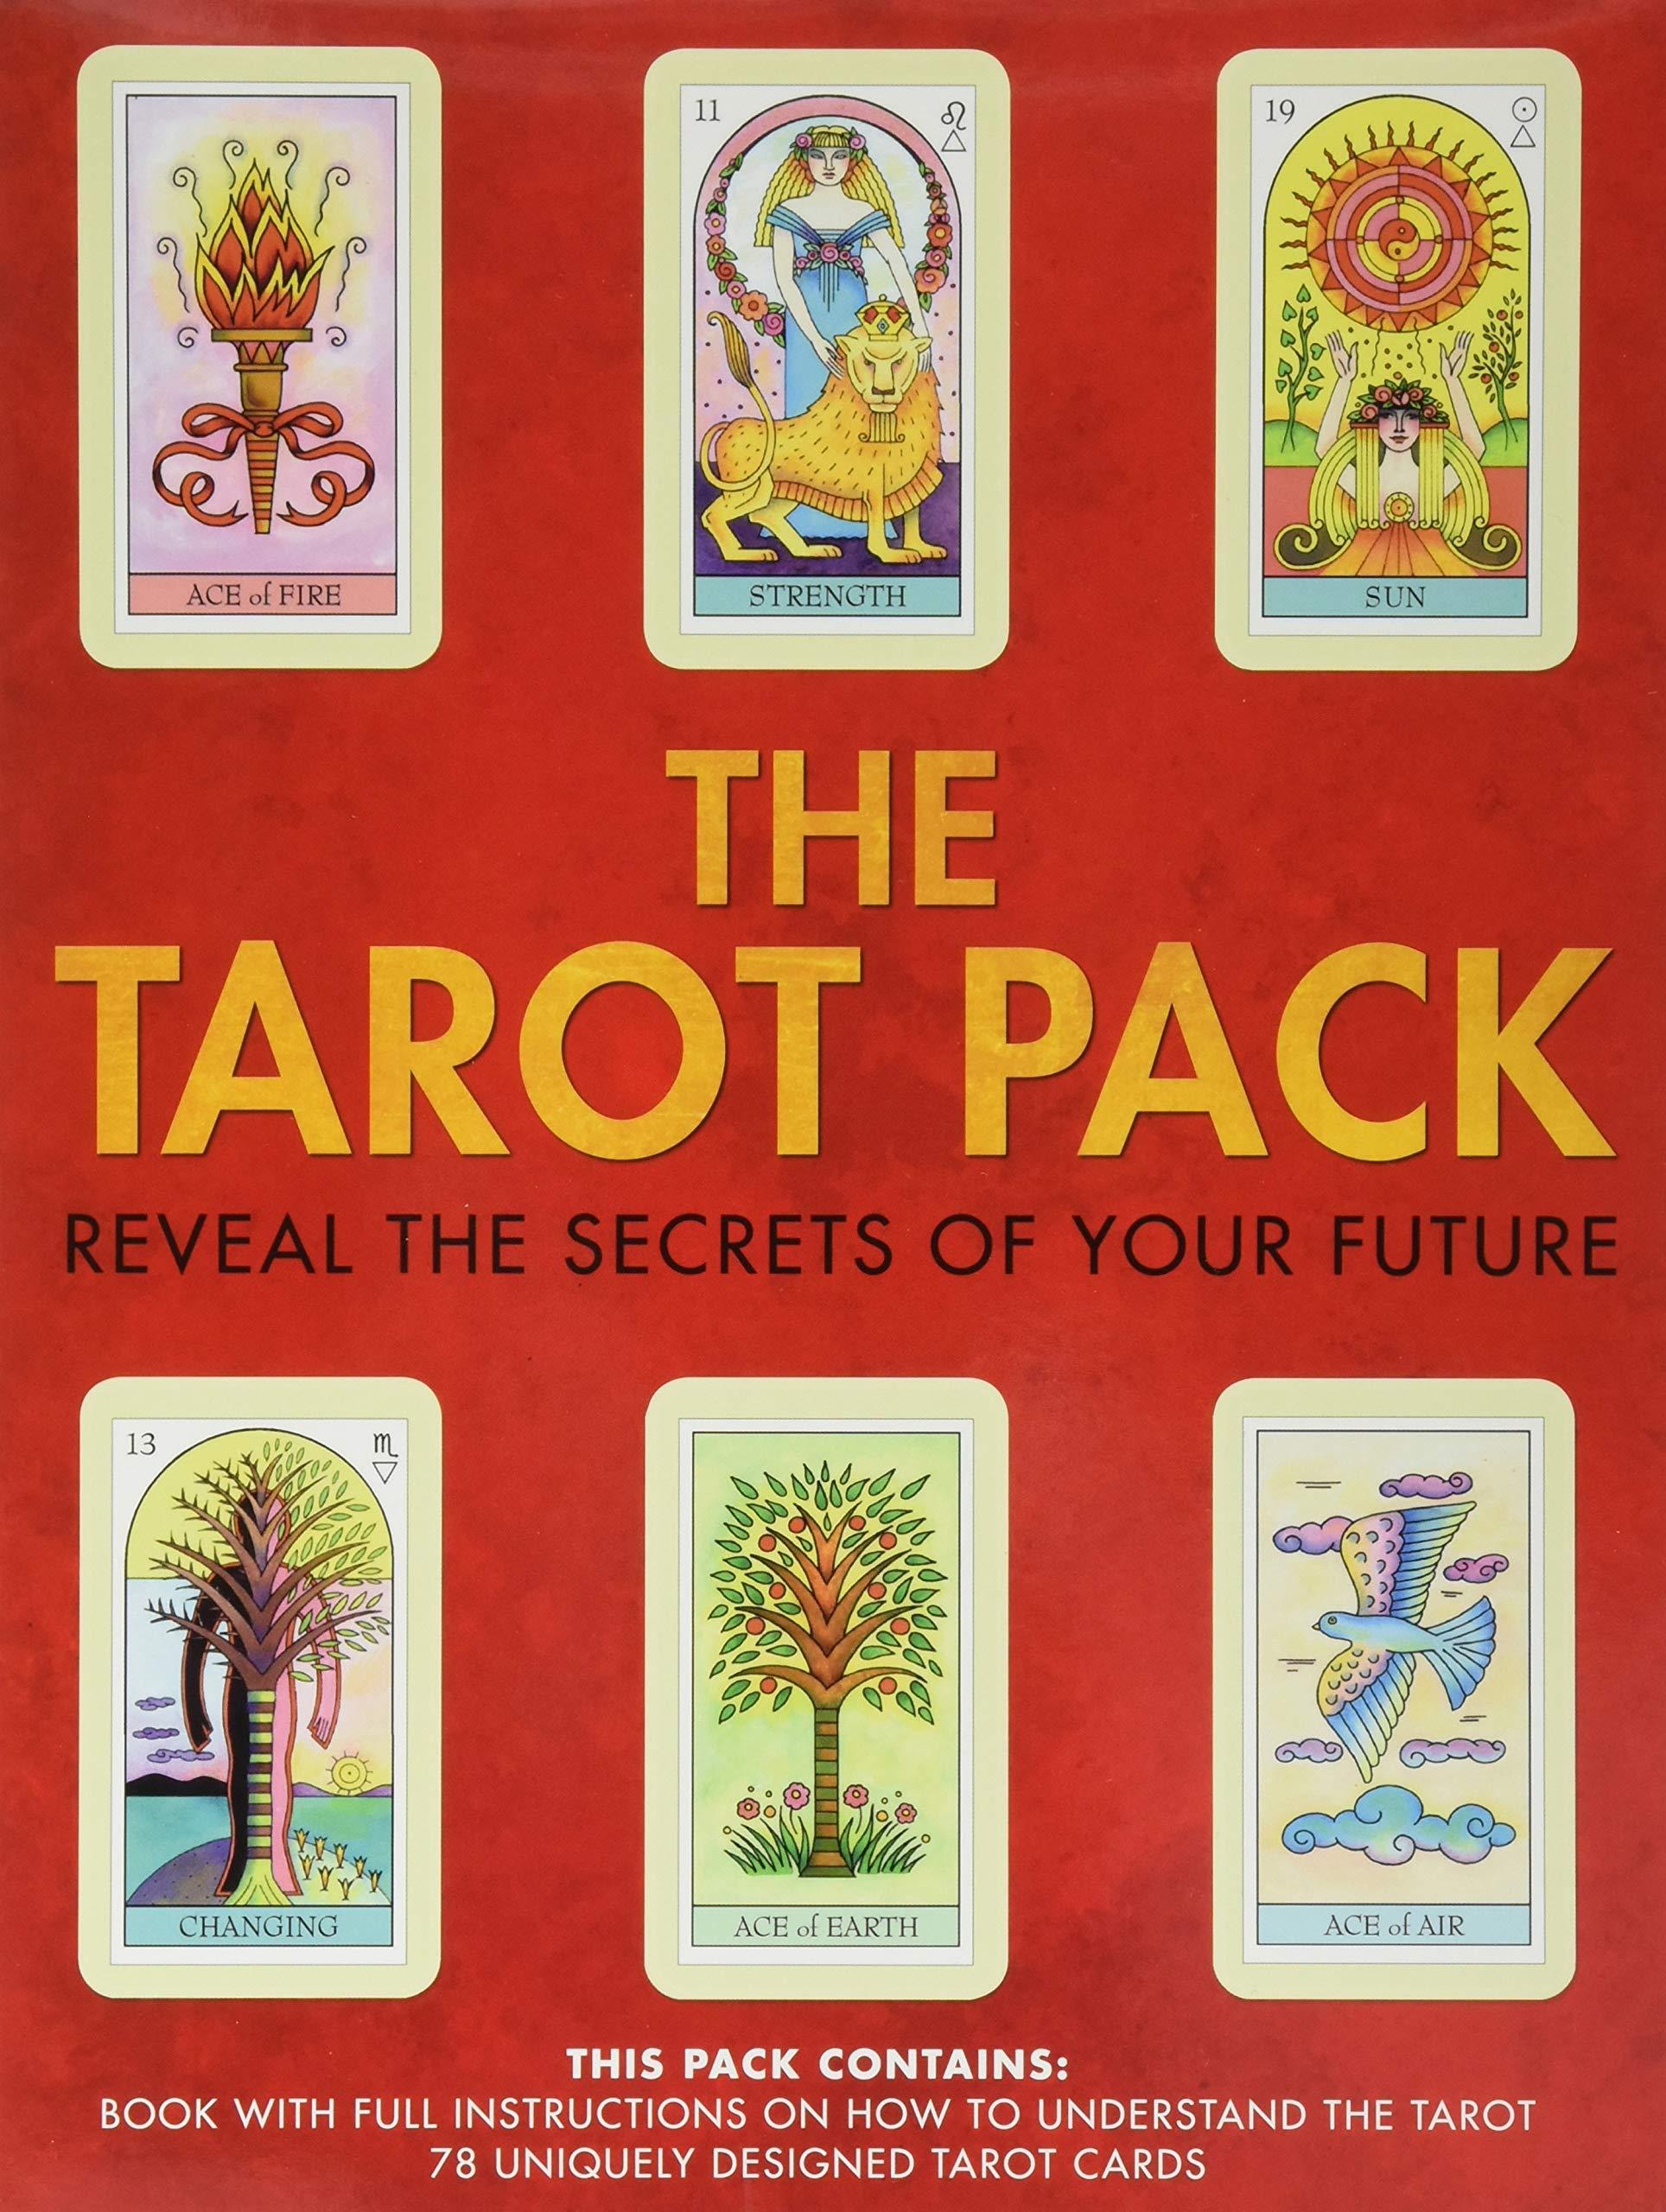 The Tarot Pack: Amazon.es: Caroline Smith: Libros en idiomas extranjeros